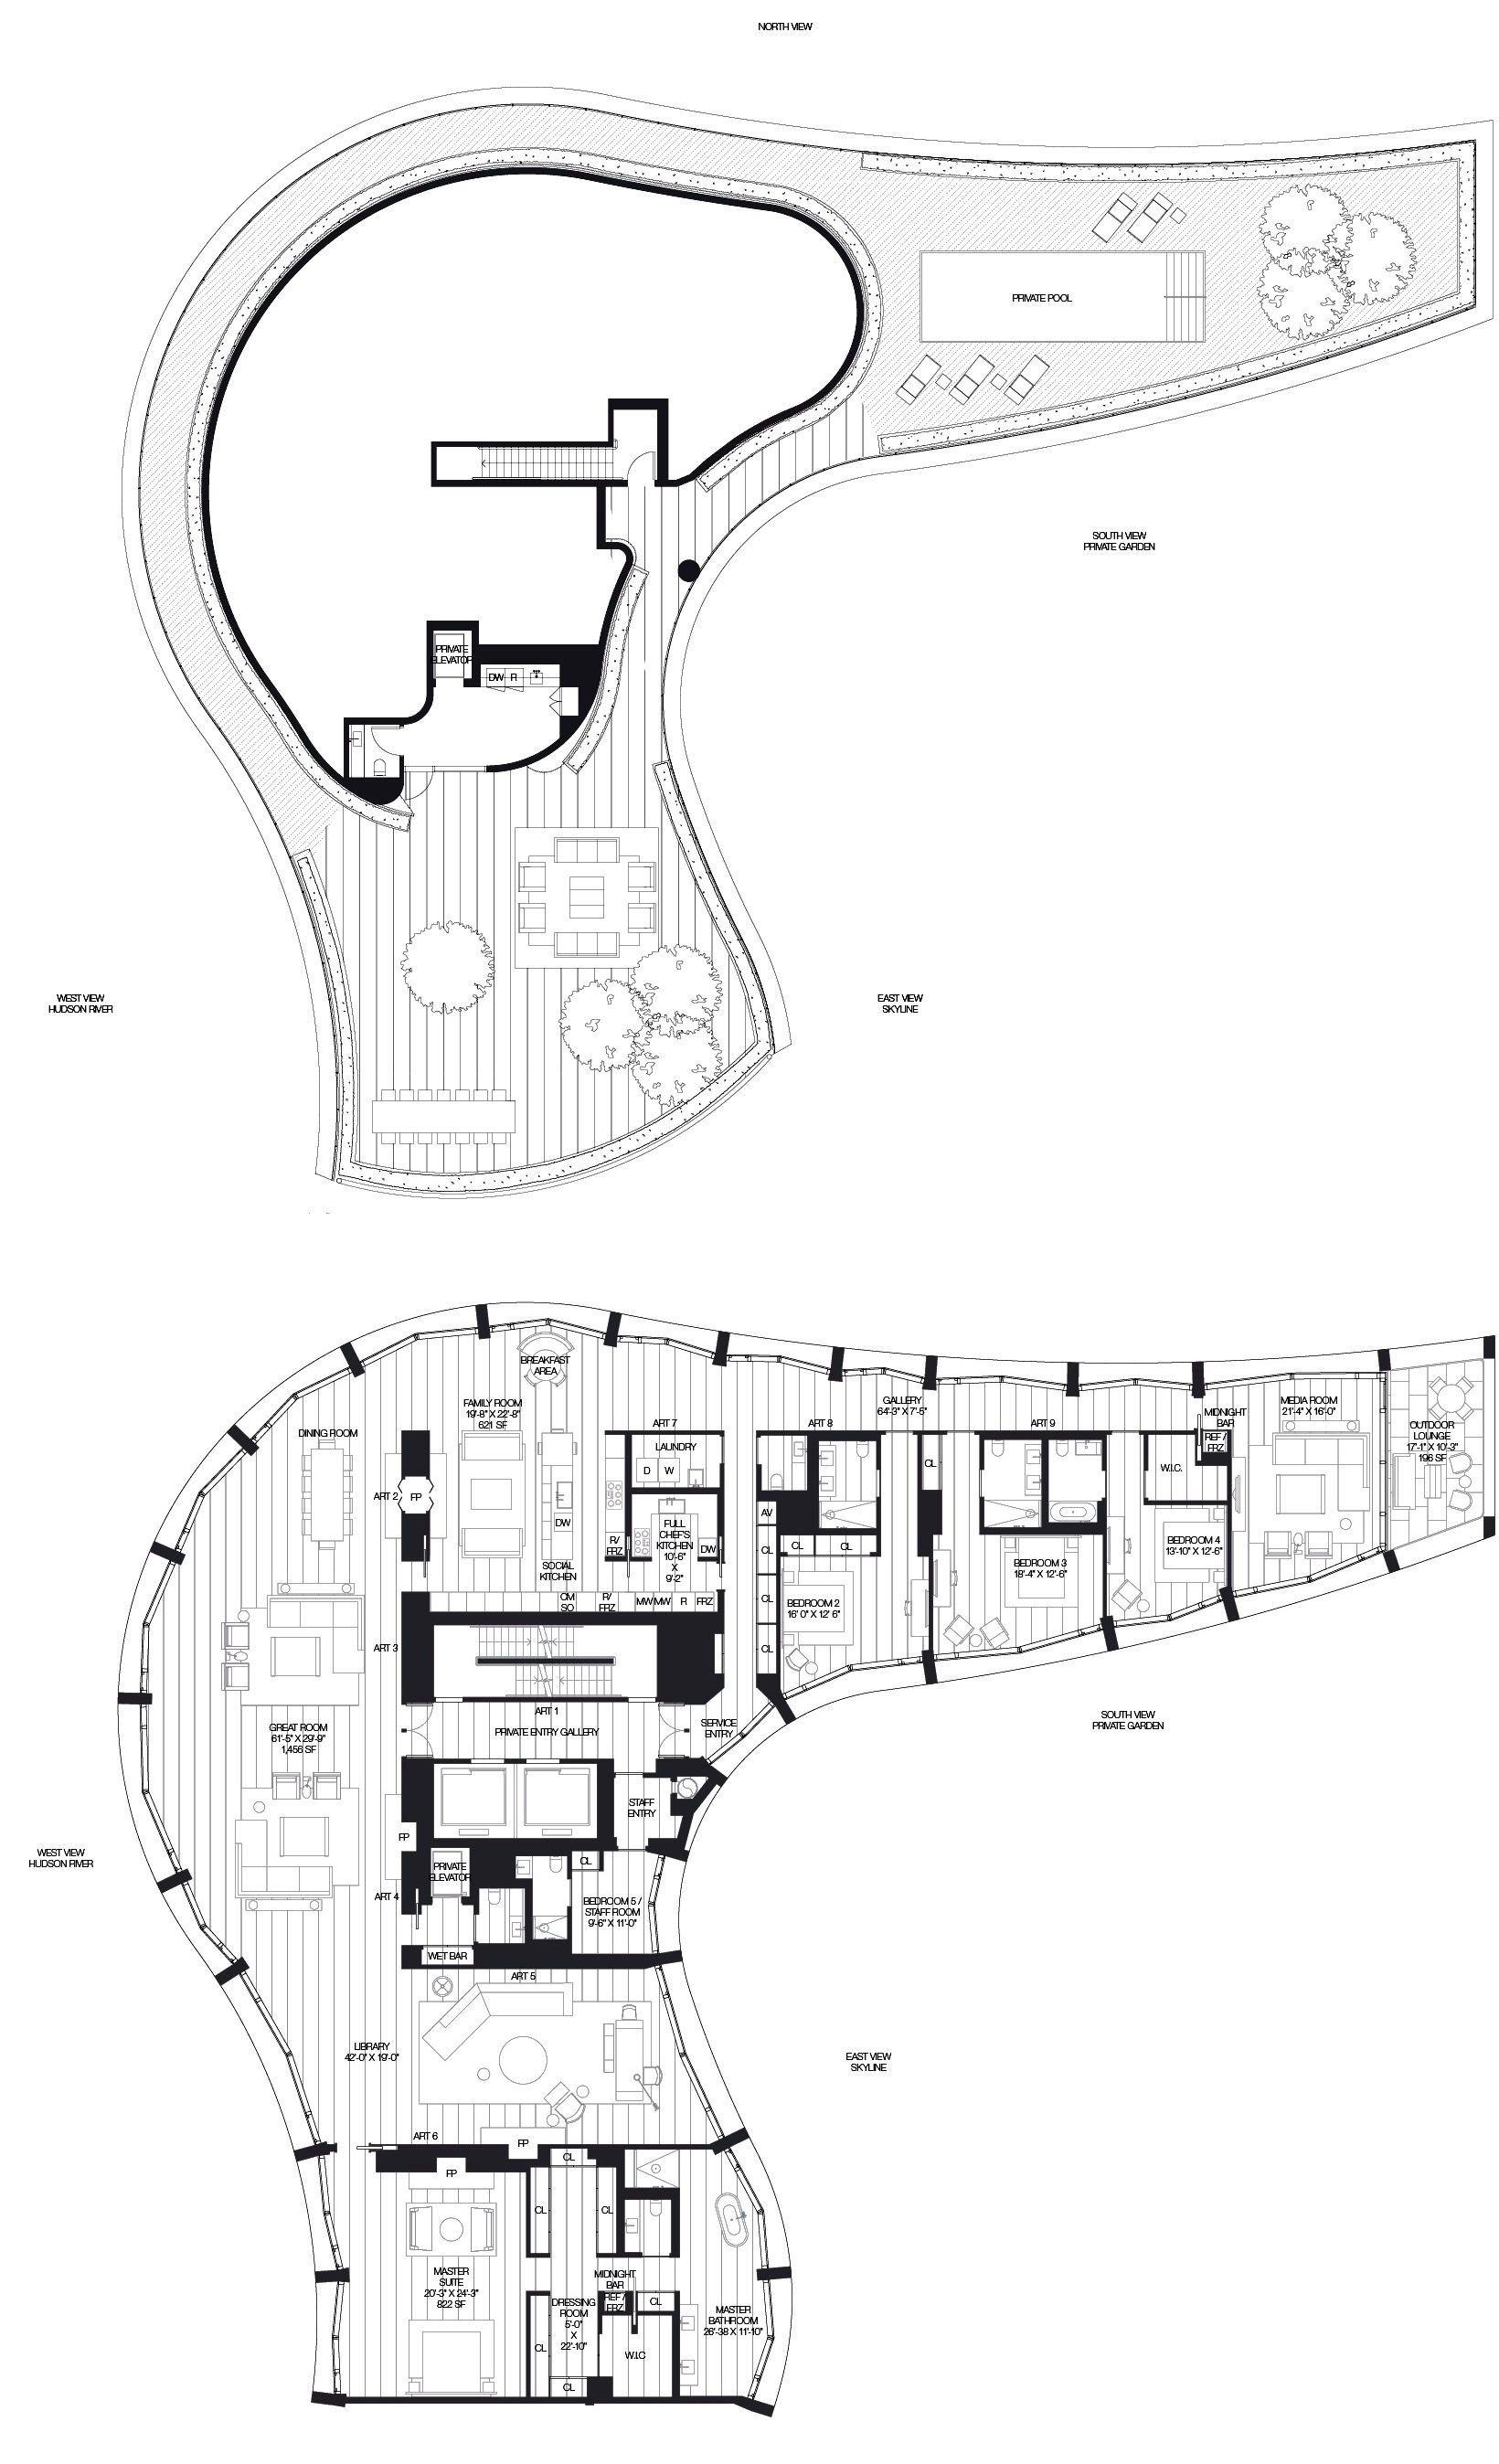 160 leroy new york penthouse north 5 bed 5 bath interior 7 750 sqft rh pinterest com